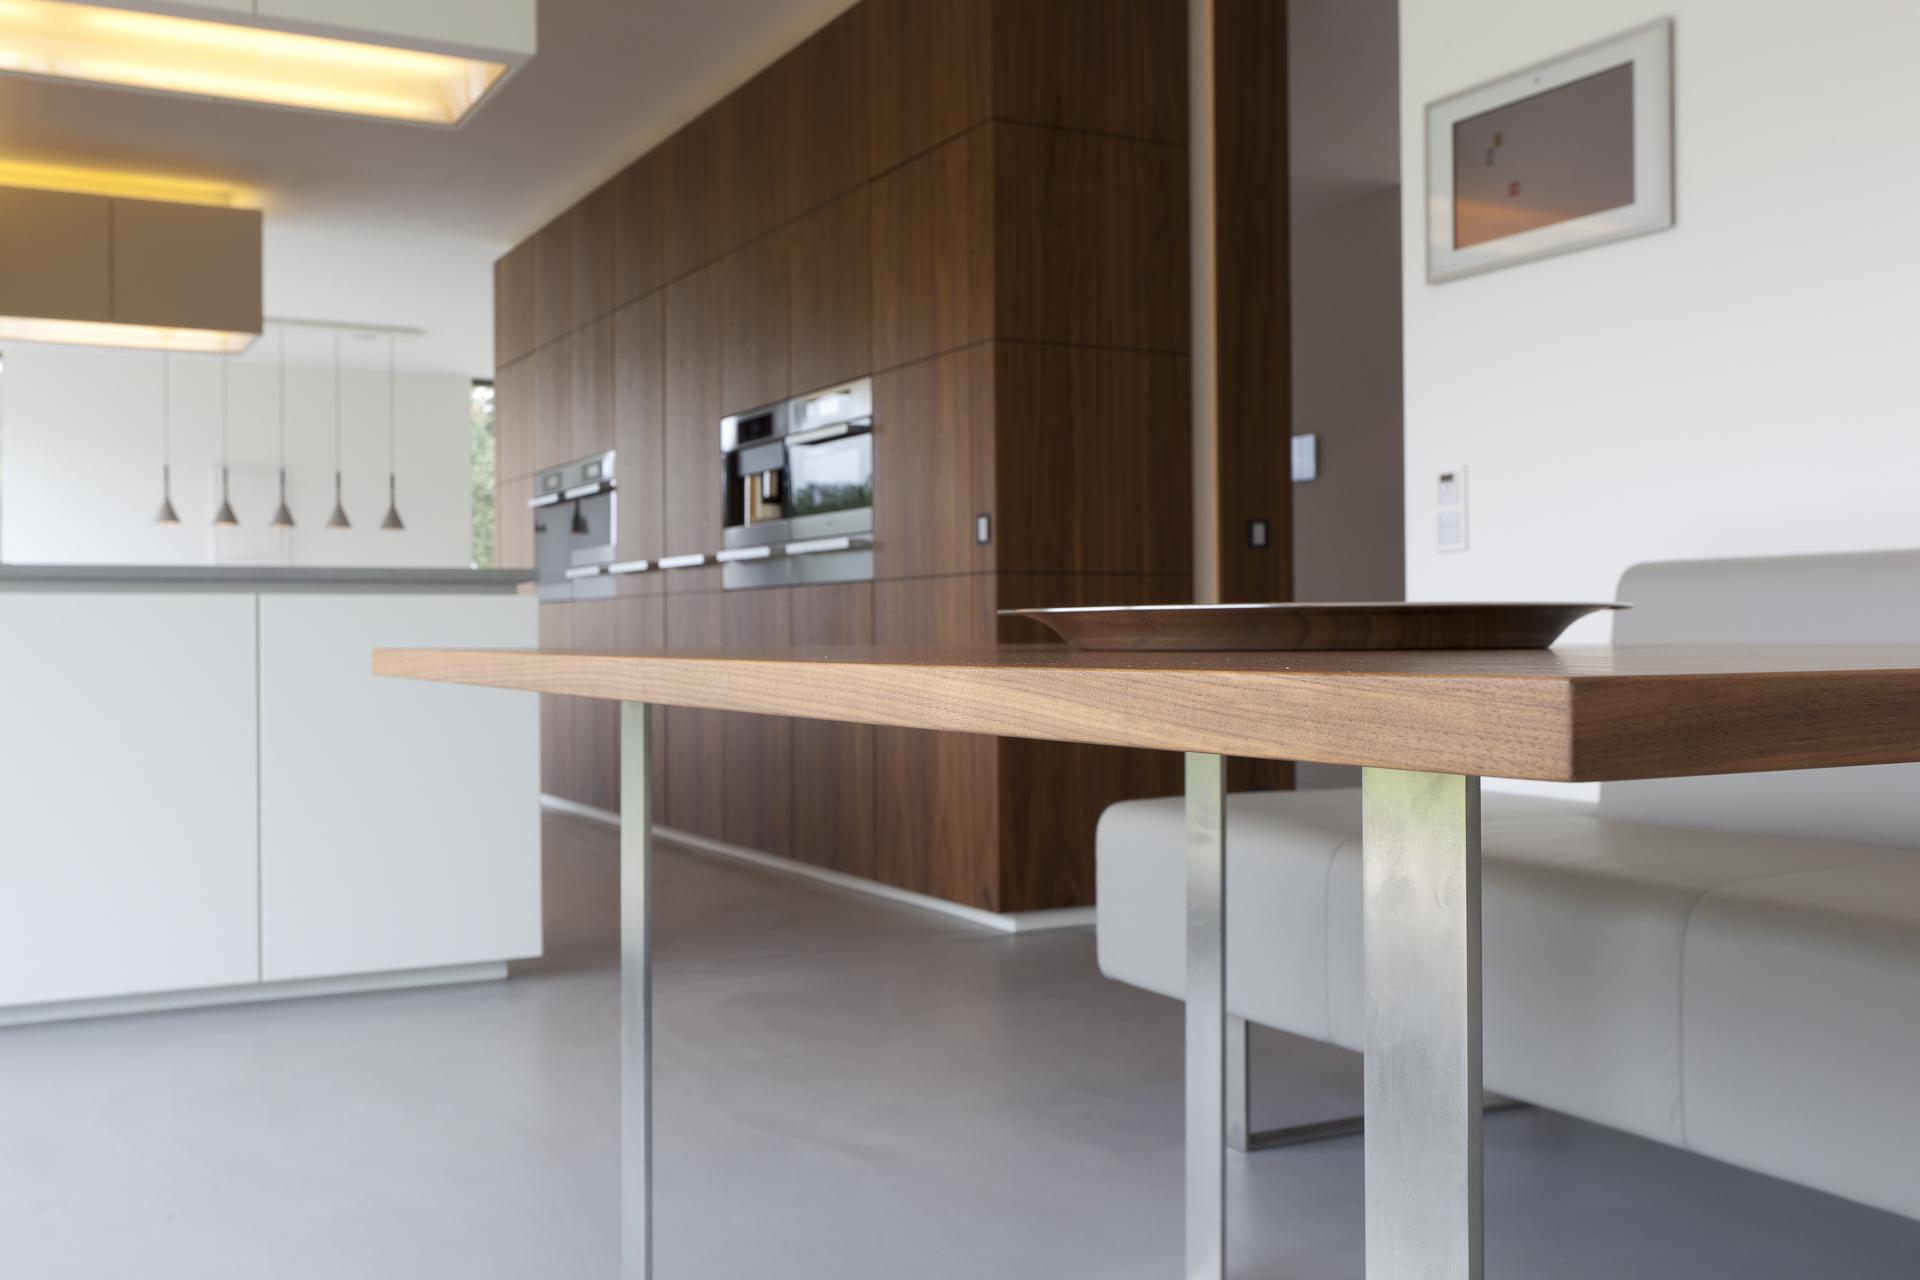 Peter_Leenders_Fotografie_Wrede_Architekten-11